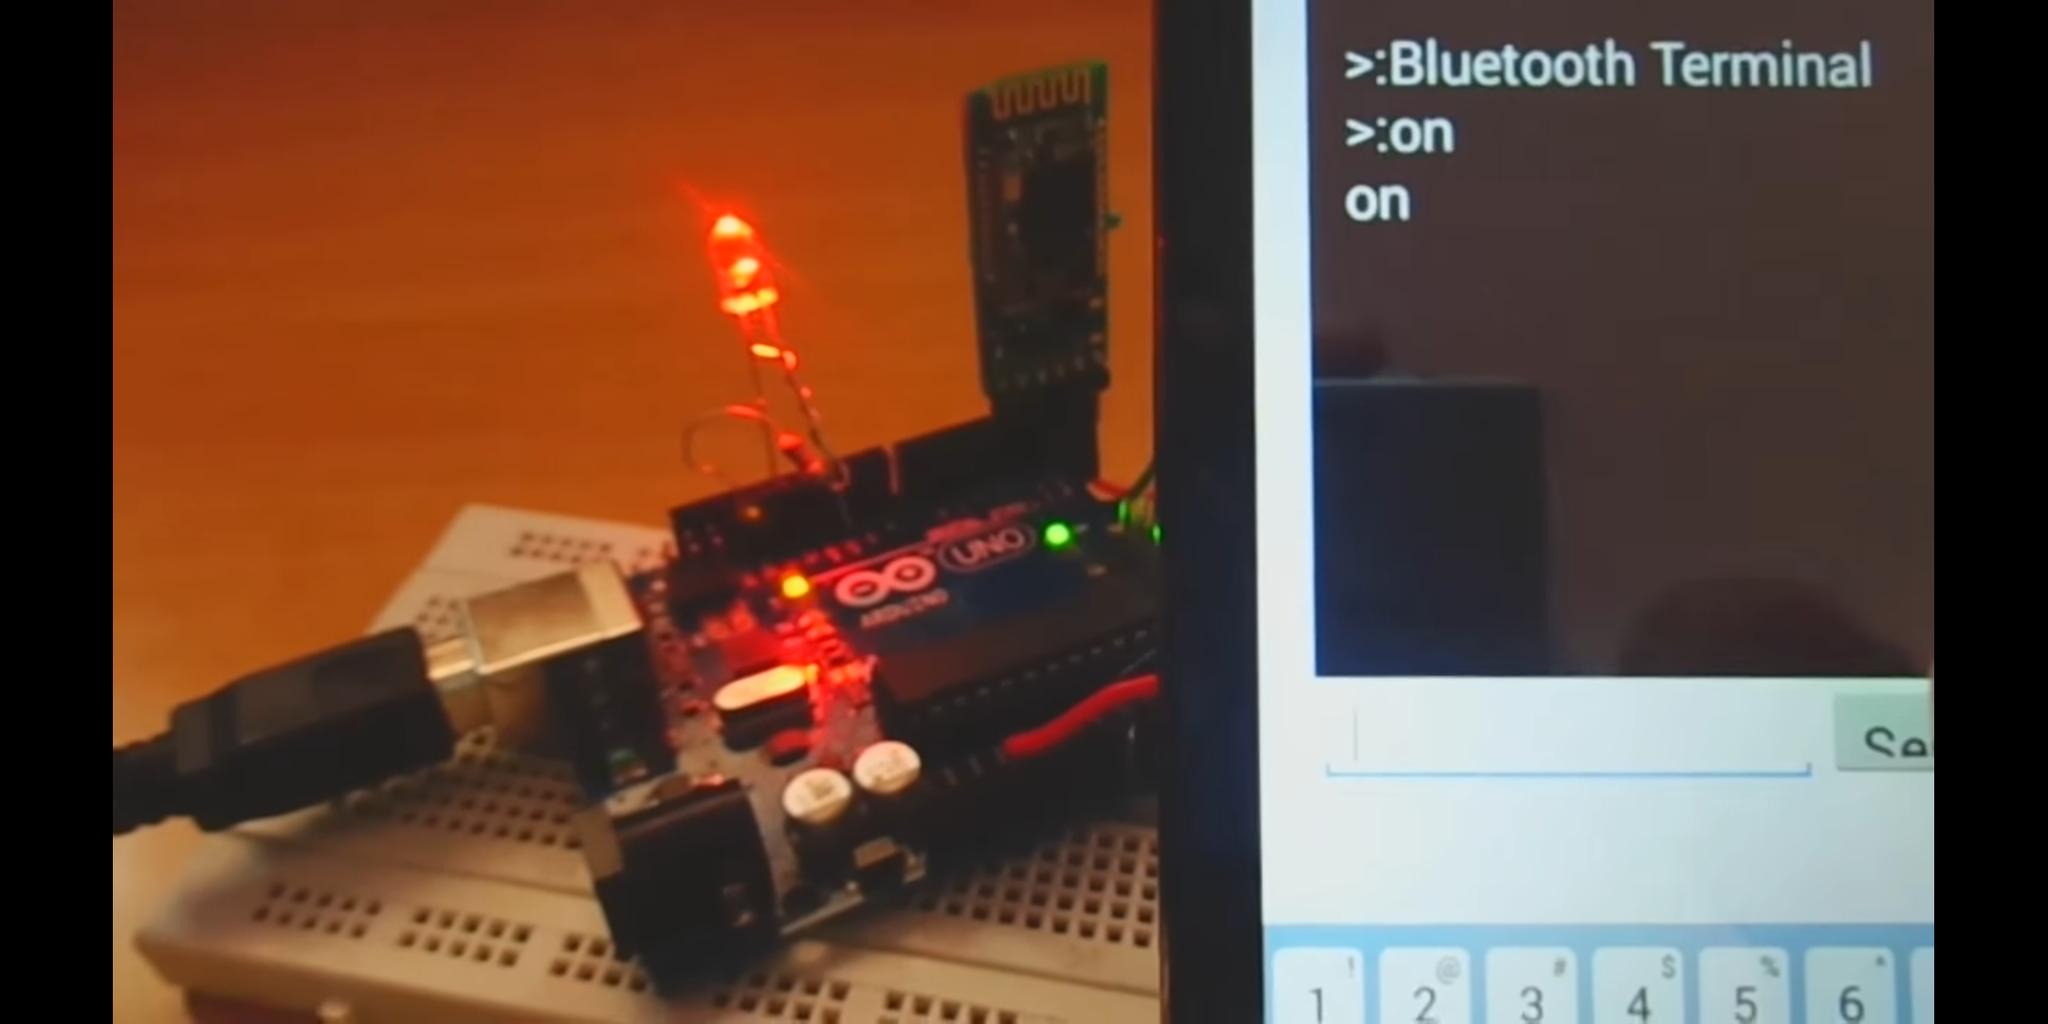 Control Led Using Smart Phone